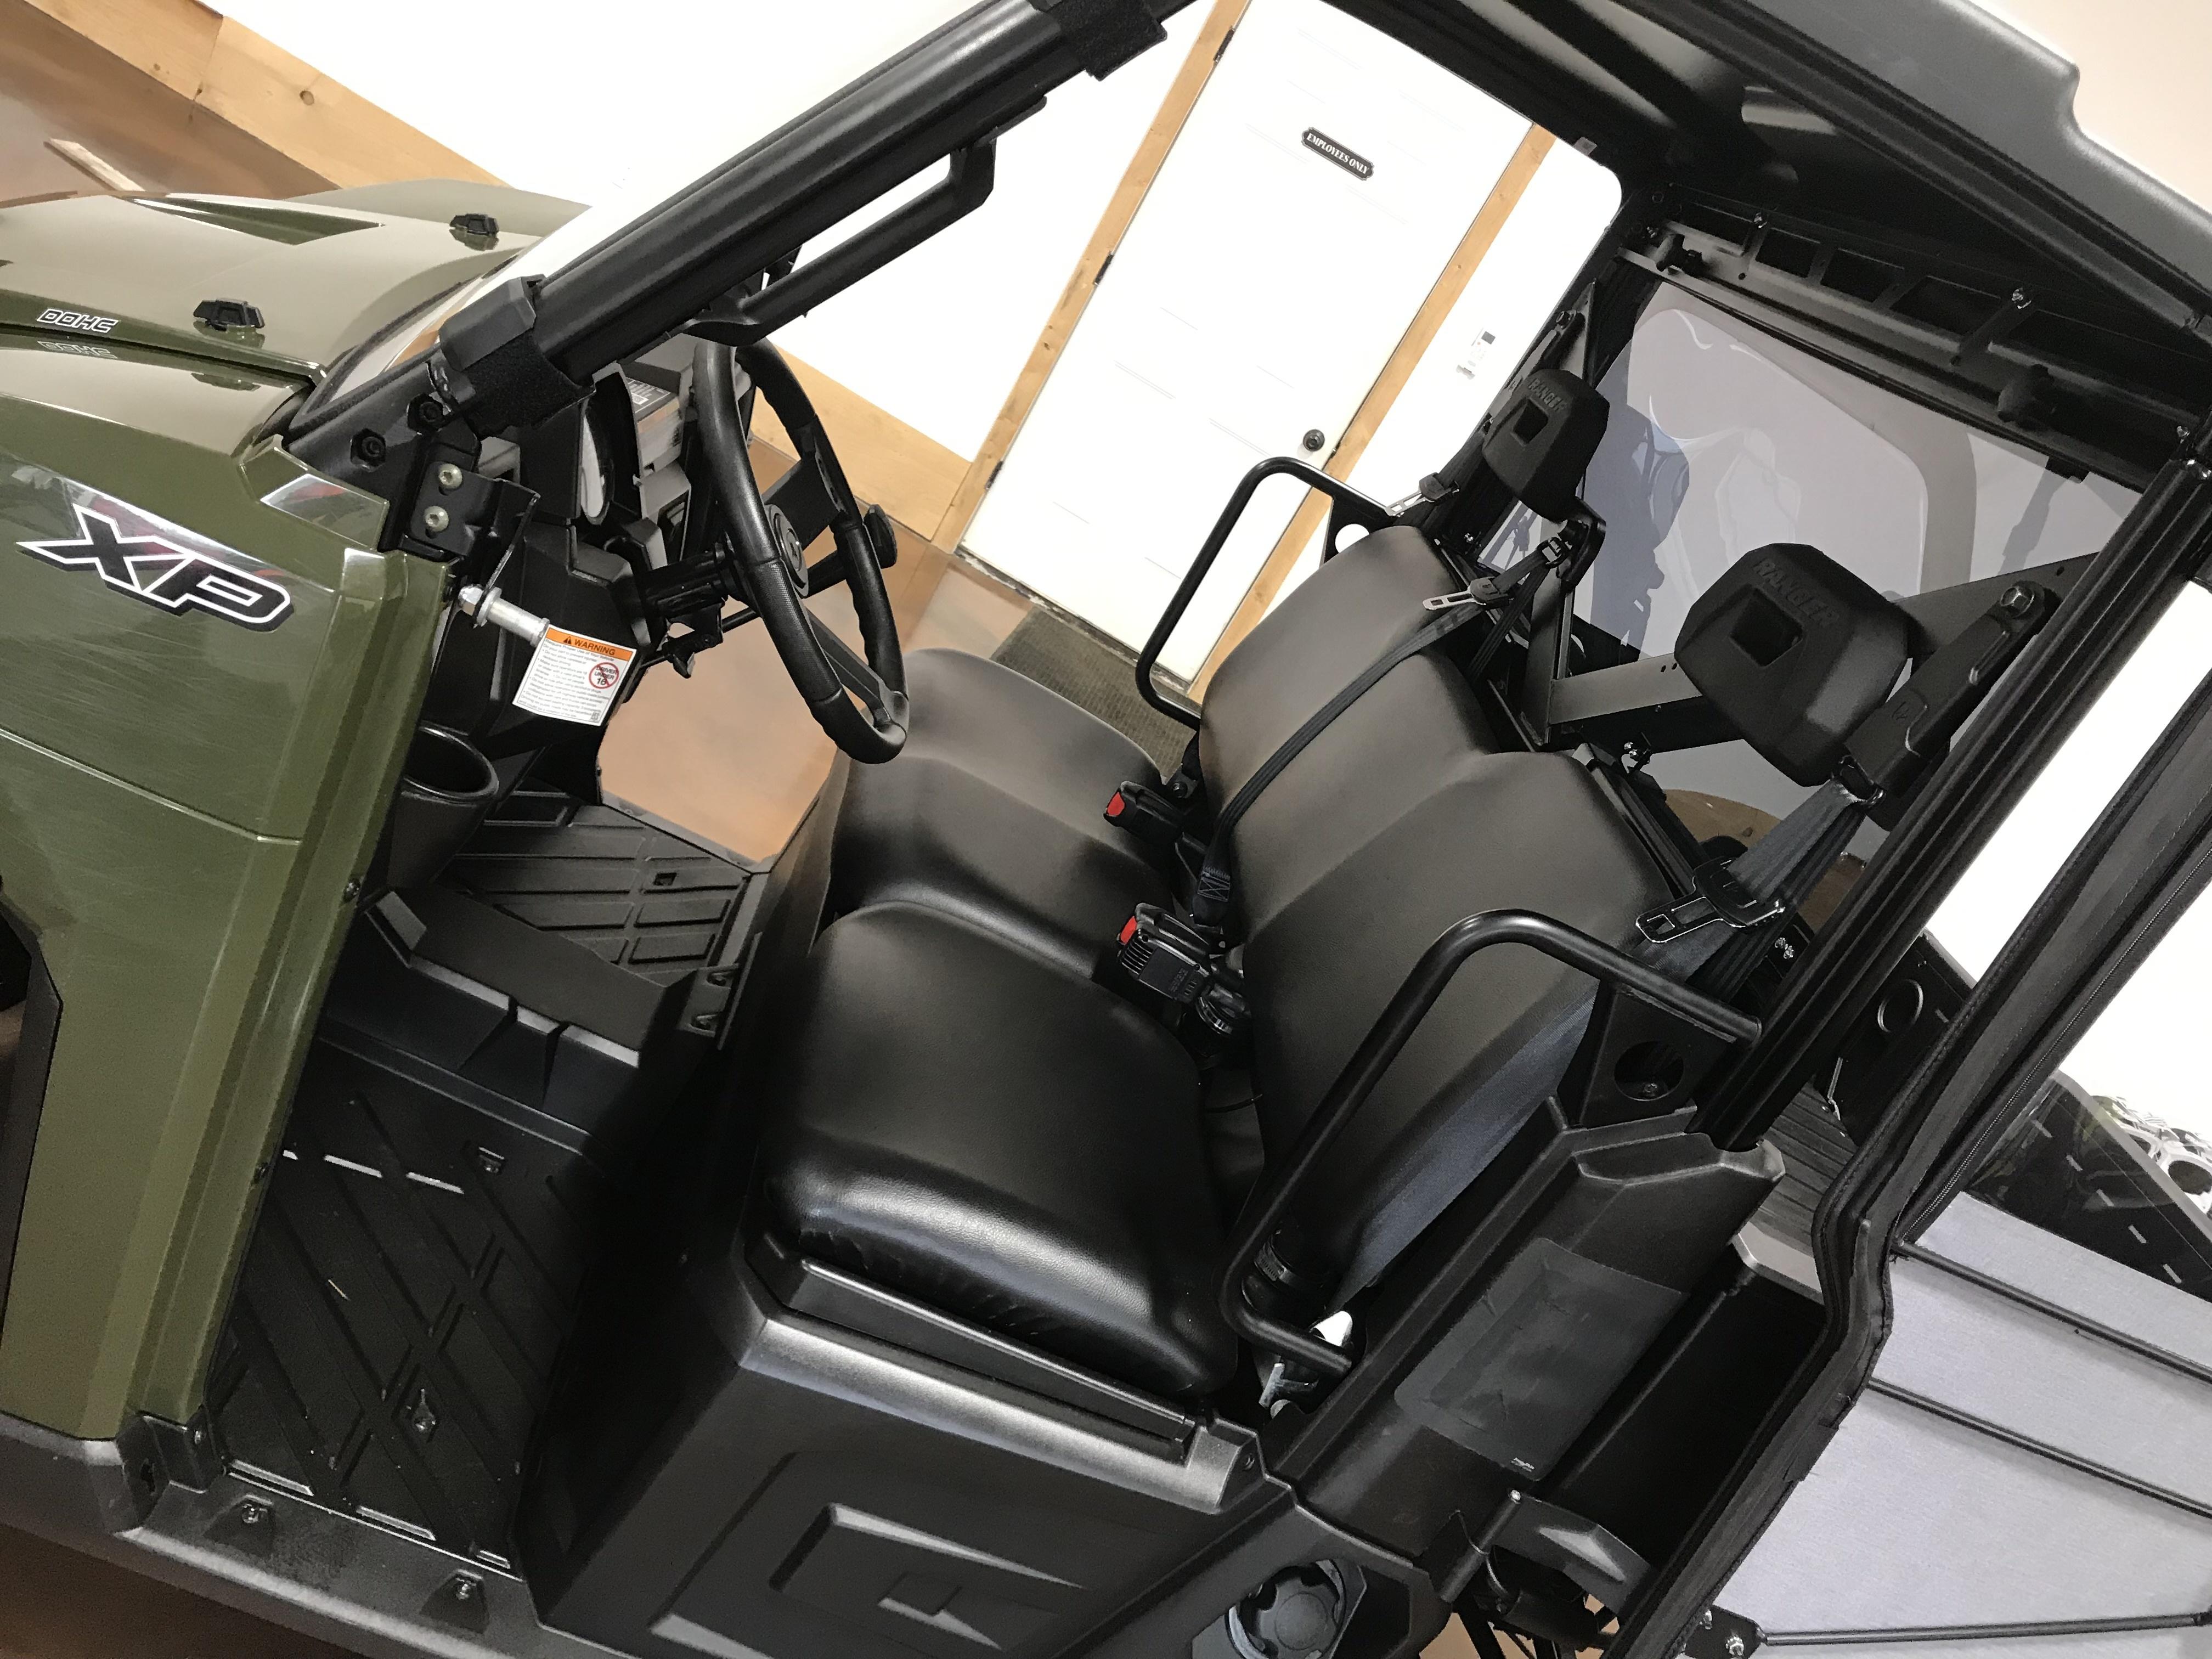 2018 Polaris Ranger XP 900 EPS - Full Cab & ONLY 540 Miles!